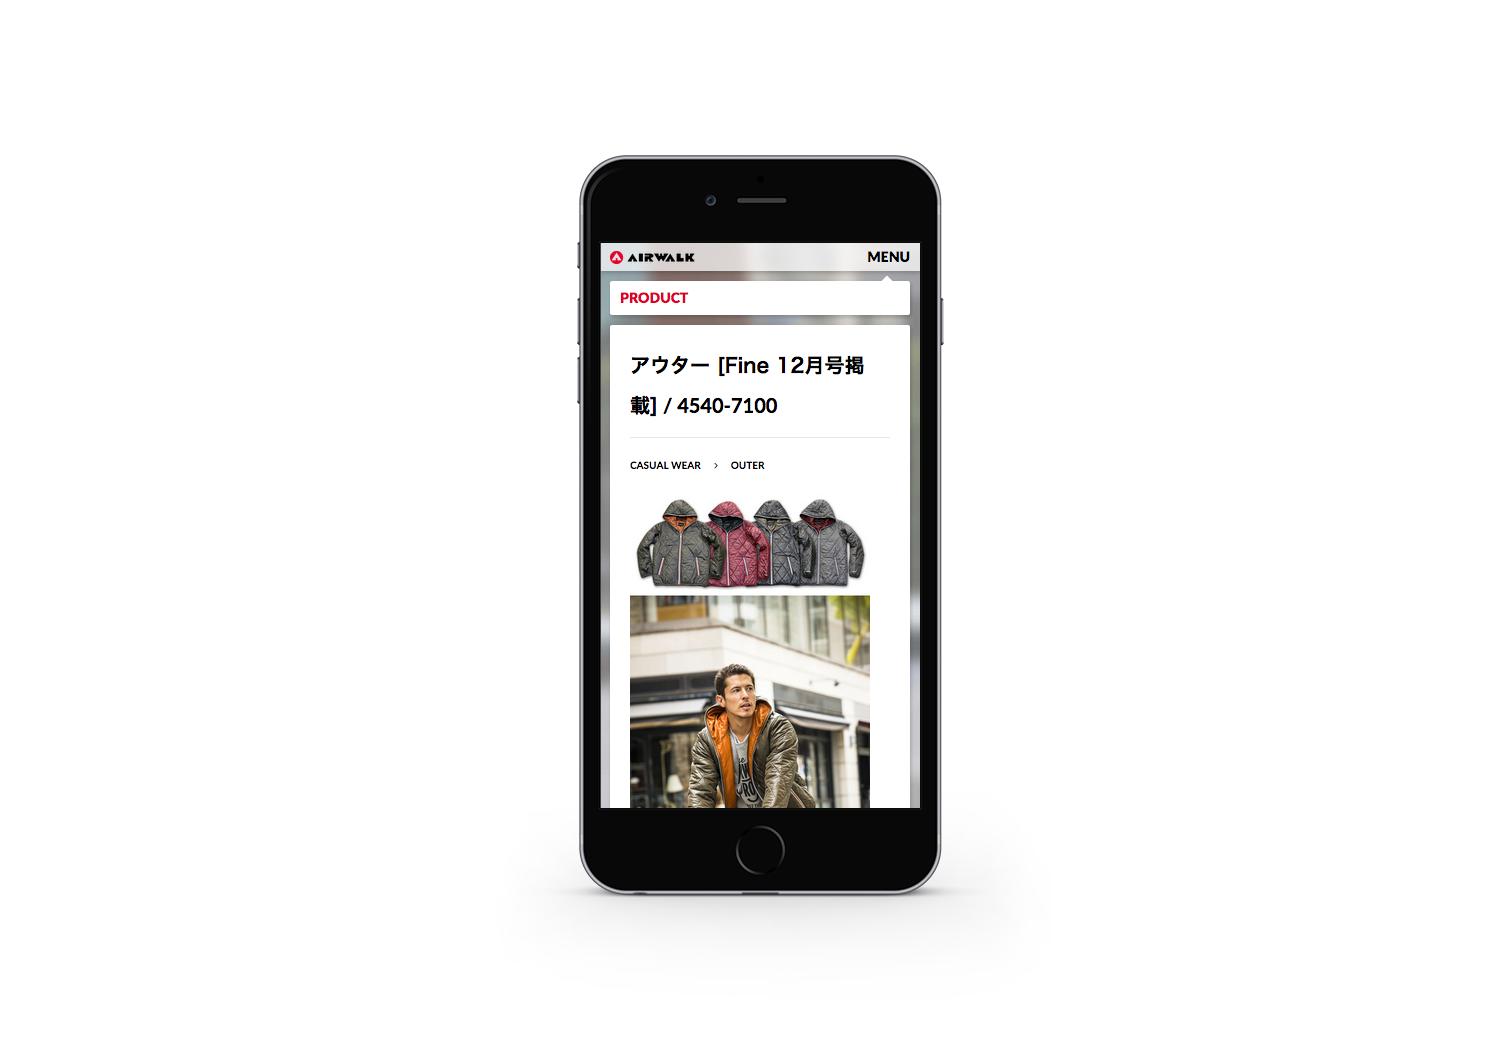 AIRWALK Official Smartphone site 2014